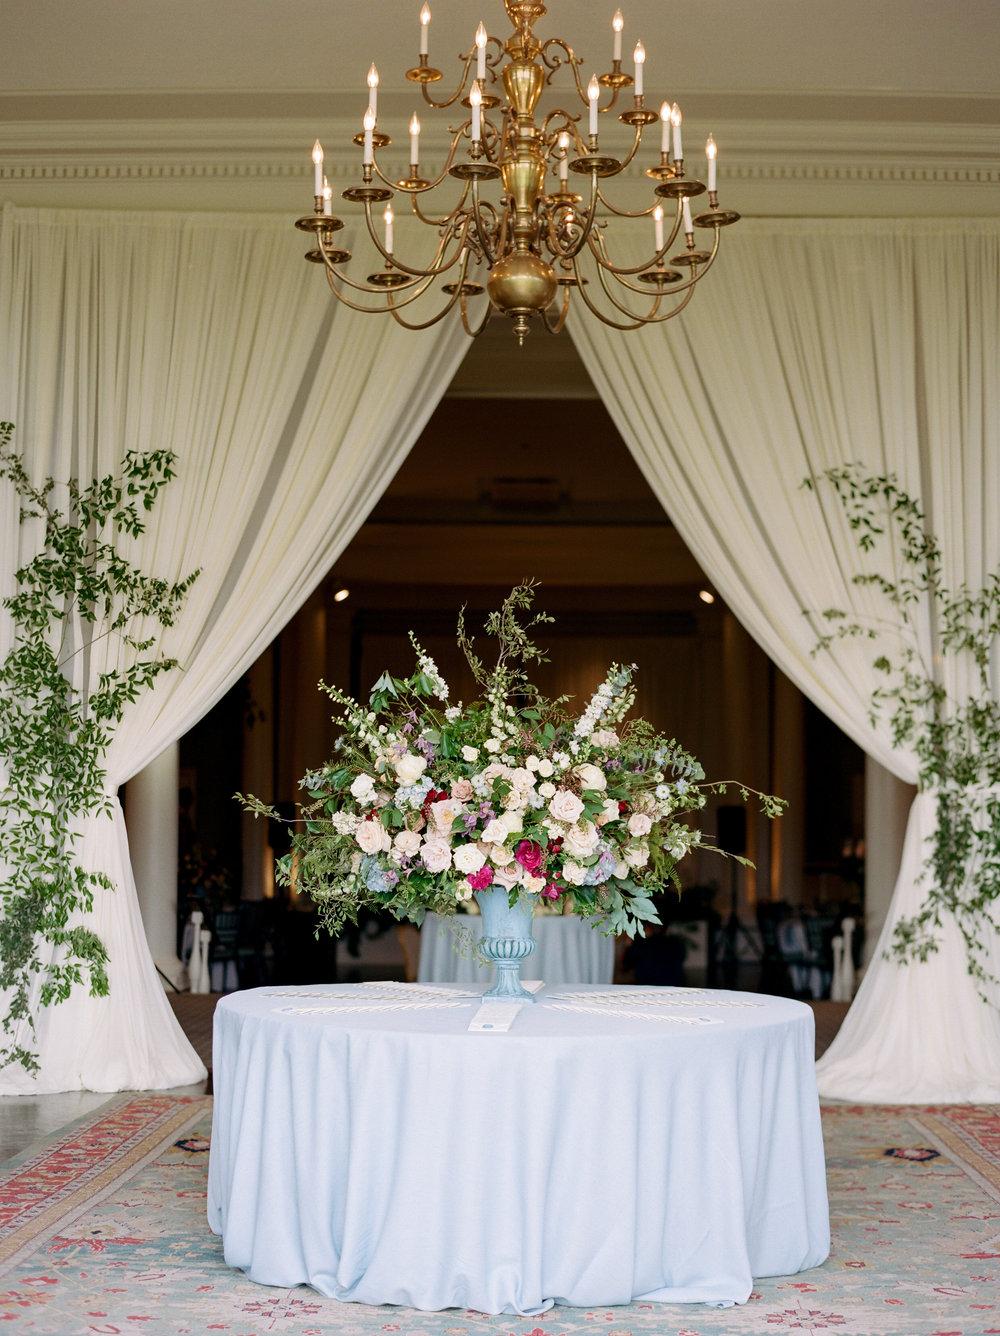 Jane Austen meets Monet - Mary + DanPhotography: Josh and Dana FernandezPlanning: Kelly DoonanFlorist: MibellarosaVenue: Houston Country Club